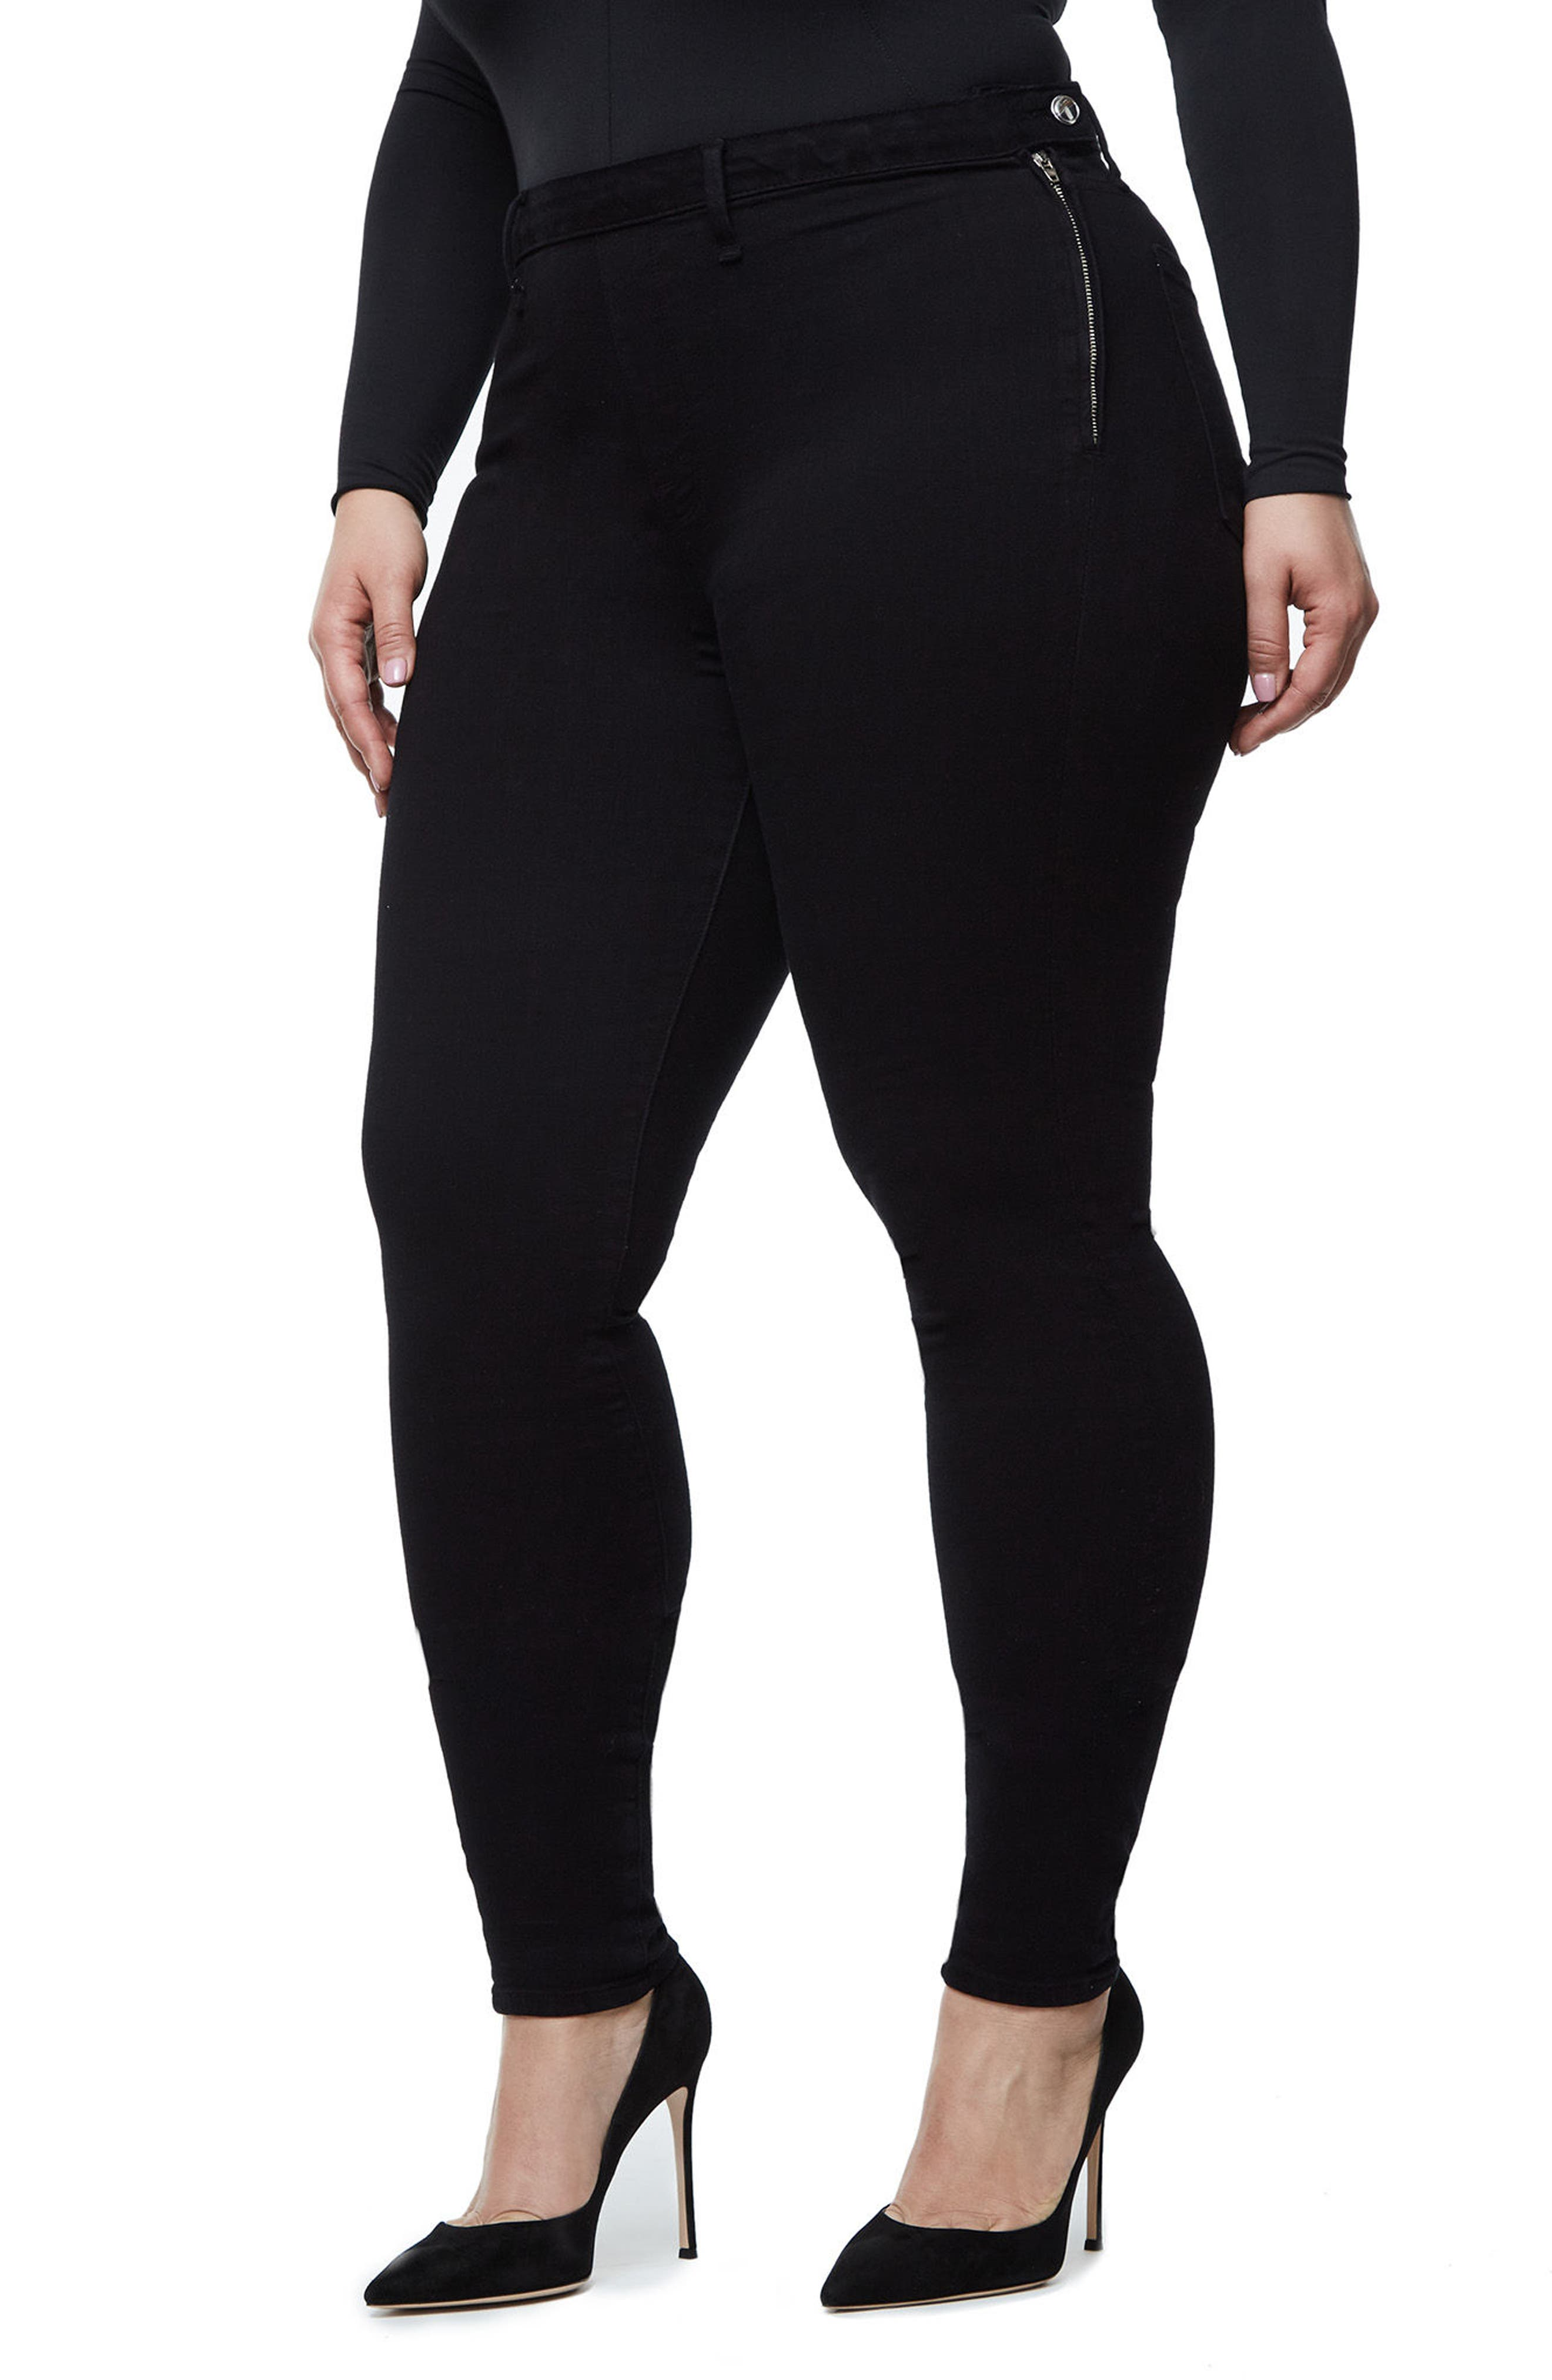 High Waist Side Zip Skinny Jeans,                             Alternate thumbnail 9, color,                             Black001